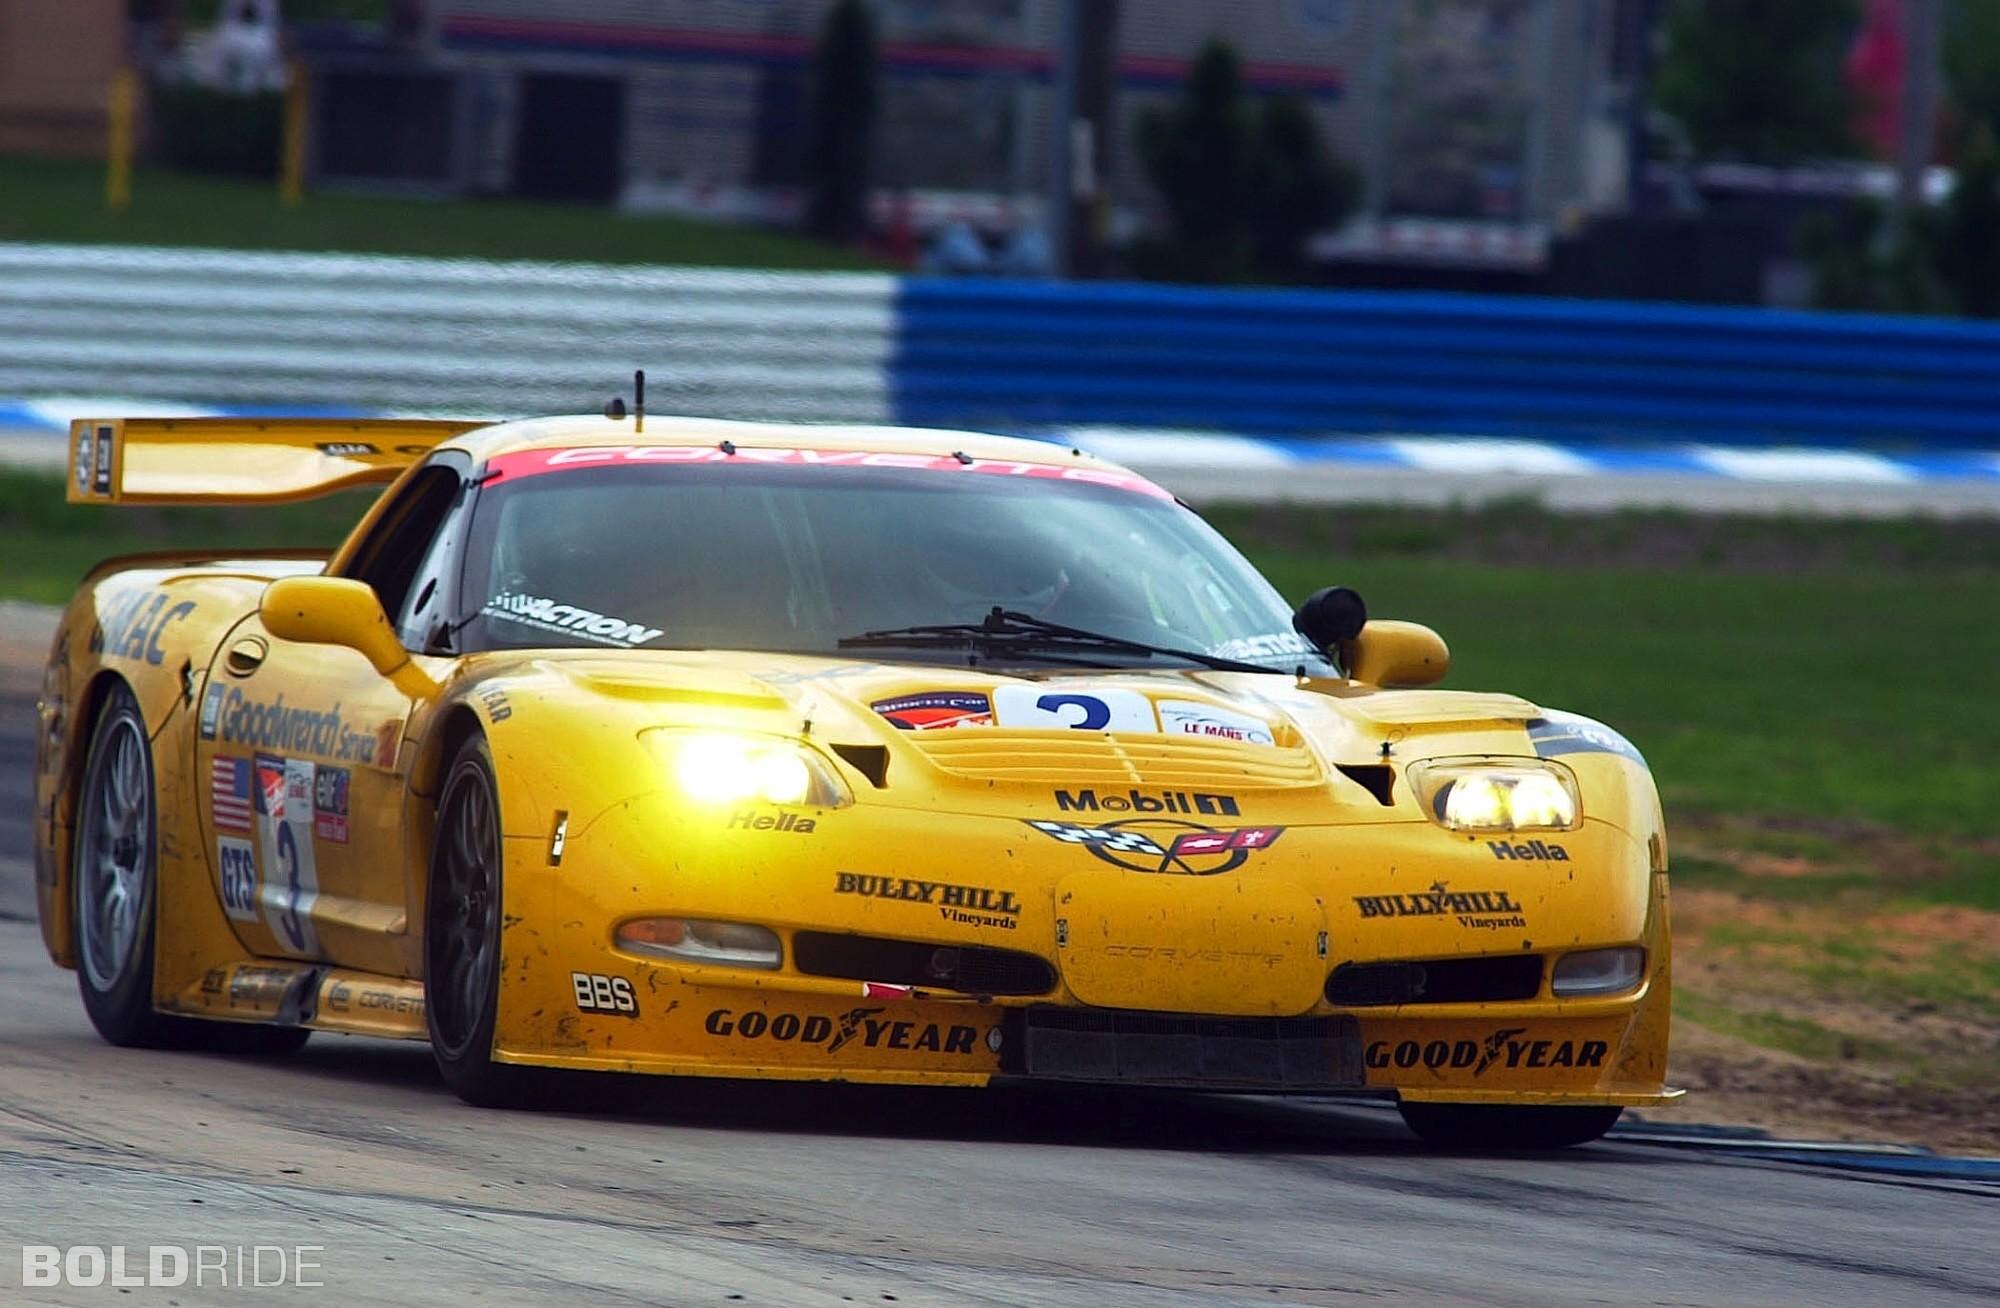 … Dale Earnhardt Jr. Is. 2001 Chevrolet Corvette C5 R 20 Supercar  Supercars Race Racing O Wallpaper 88418 WallpaperUP …